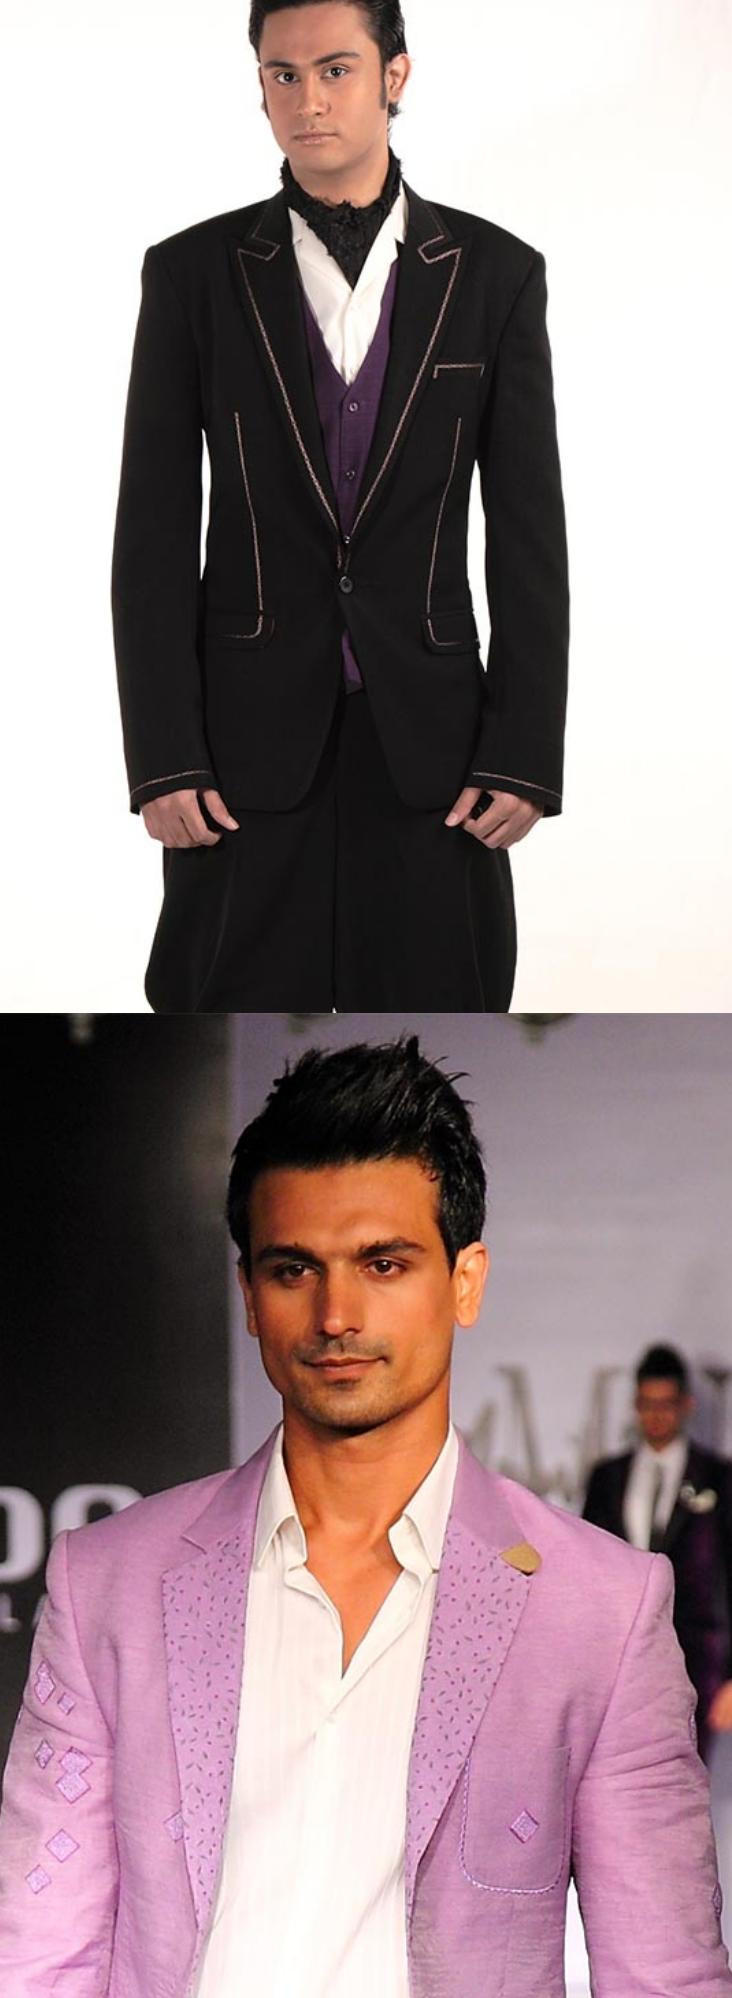 Stylish Jackets For Menu0026#39;s By Munib Nawaz New Arrivals Designs Colors Price In Pakistan